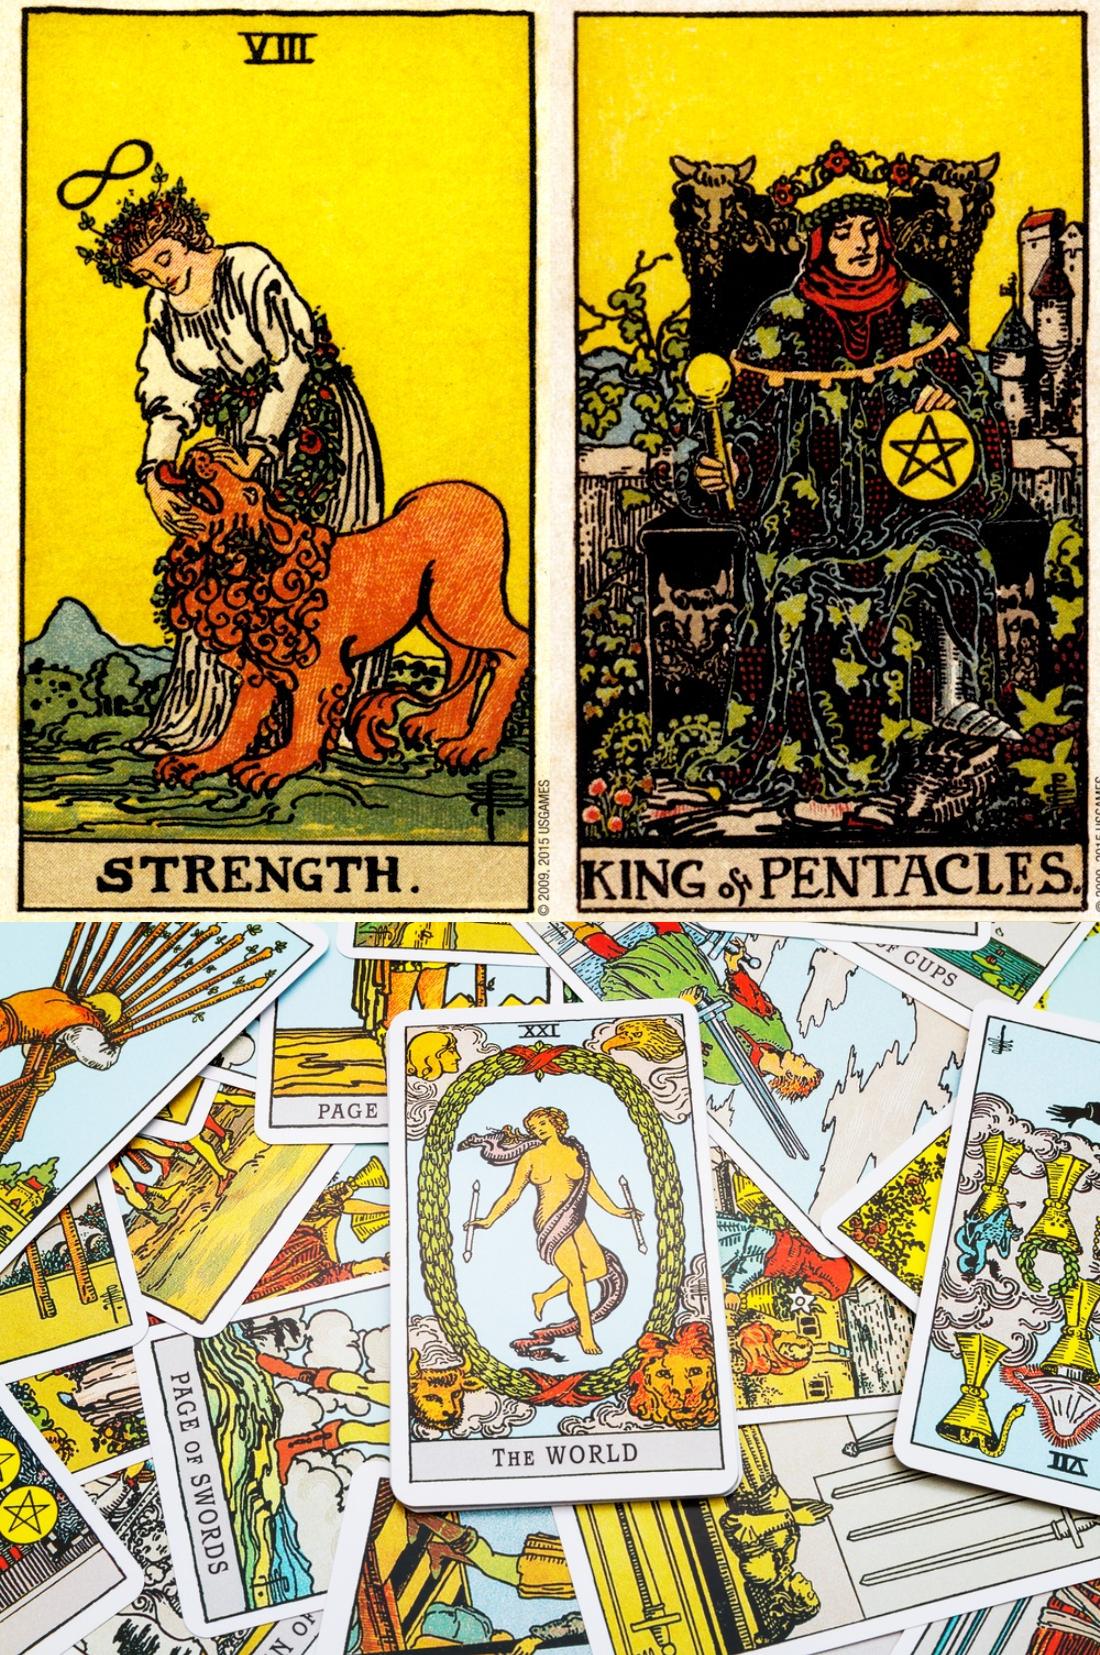 Tarot Online Online Tarot Prediction And Free Tarot Card Prediction Free Psychic Tarot Card Readi Tarot Card Predictions Free Tarot Cards Reading Tarot Cards